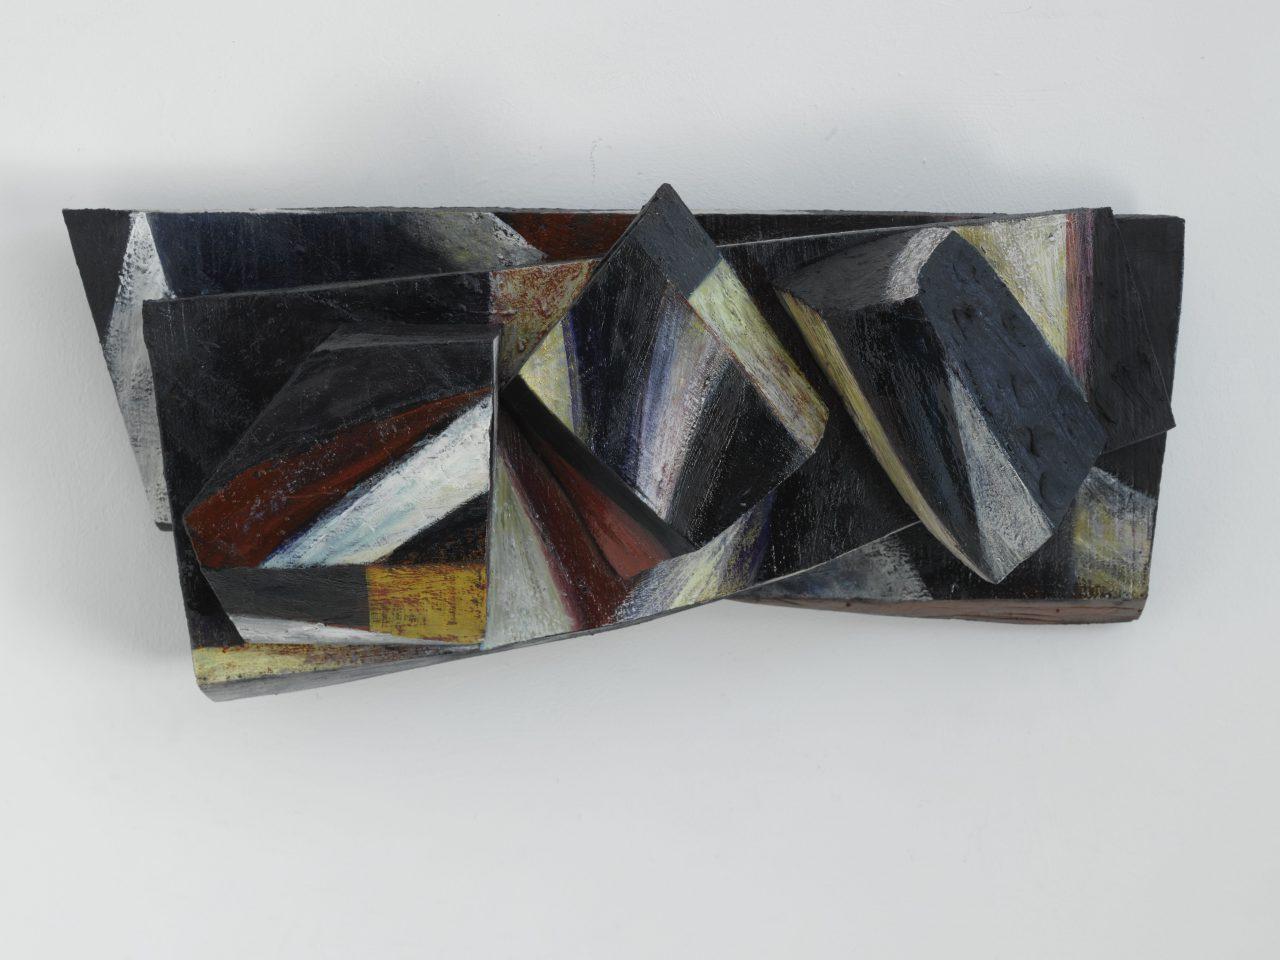 DIS, 2006 - 2008, Harzöl-Tempera auf Holz, 23 x 52 x 16 cm